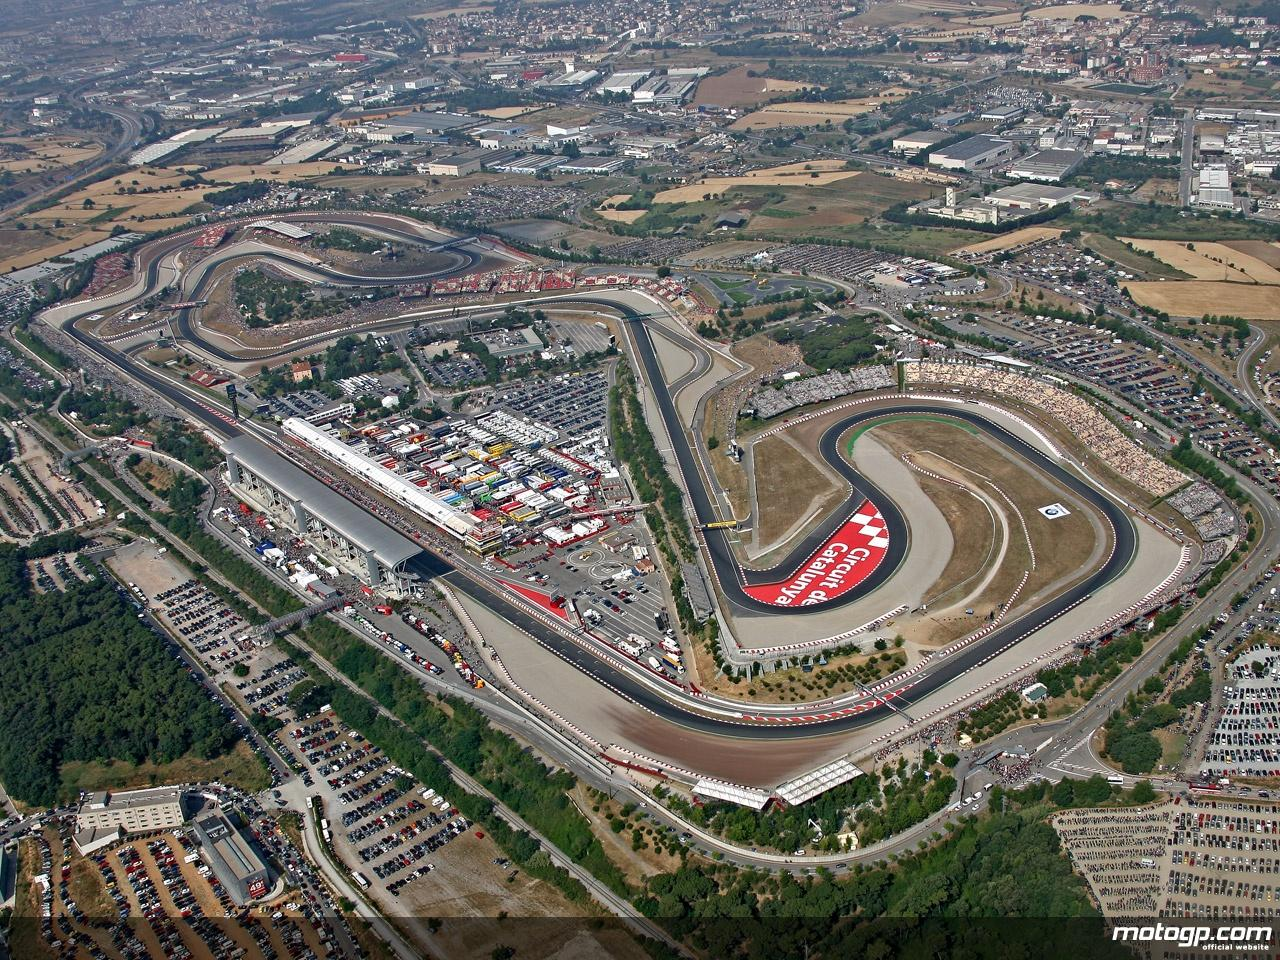 CR Castelloli / Catalunya - 12/13/14/15 Avril - Track Sense. - Page 2 Circuit-de-catalunya-barcelona